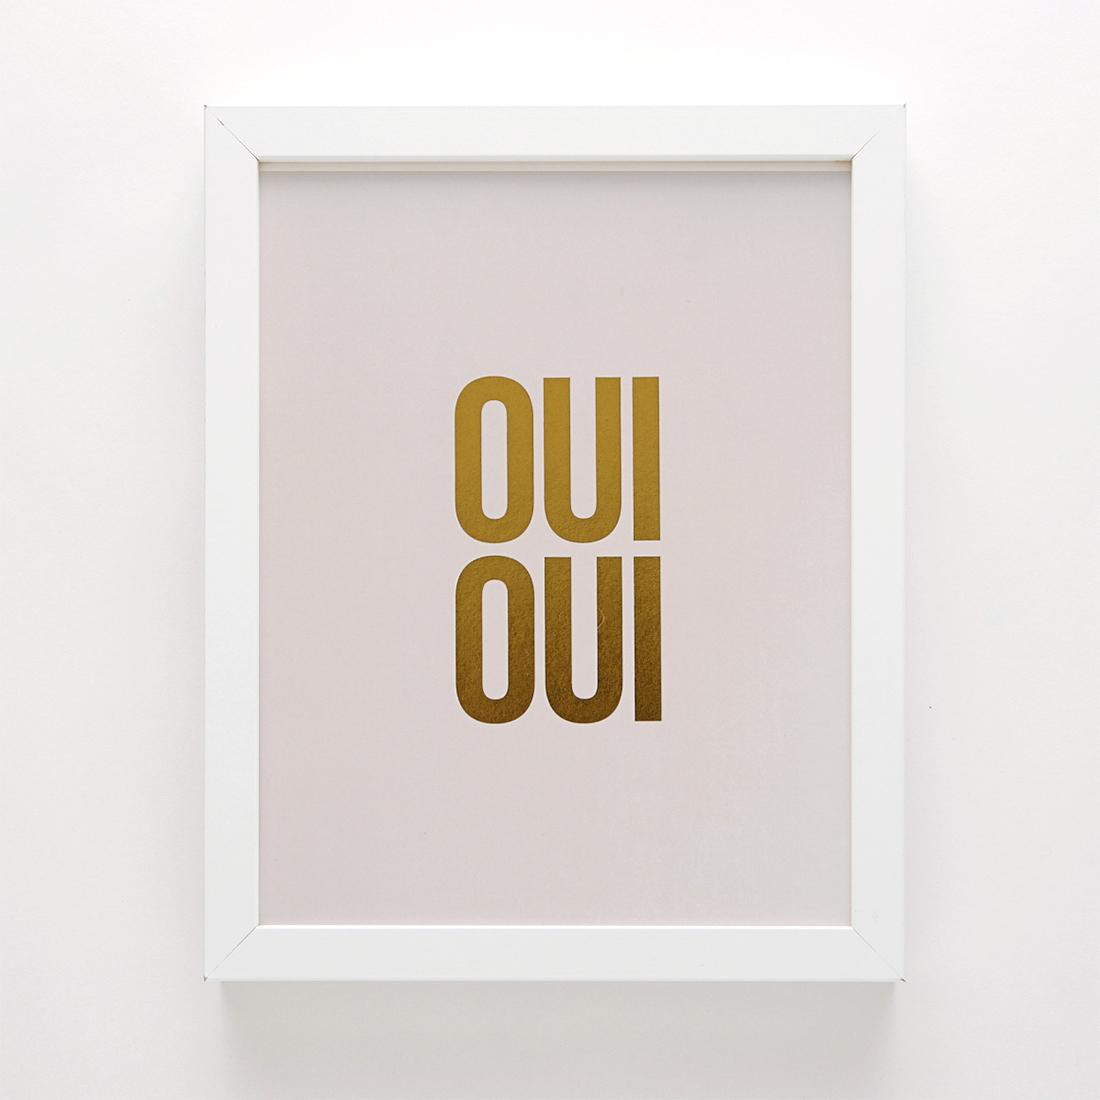 SMOUIOUI-Framed-BritCo.jpg